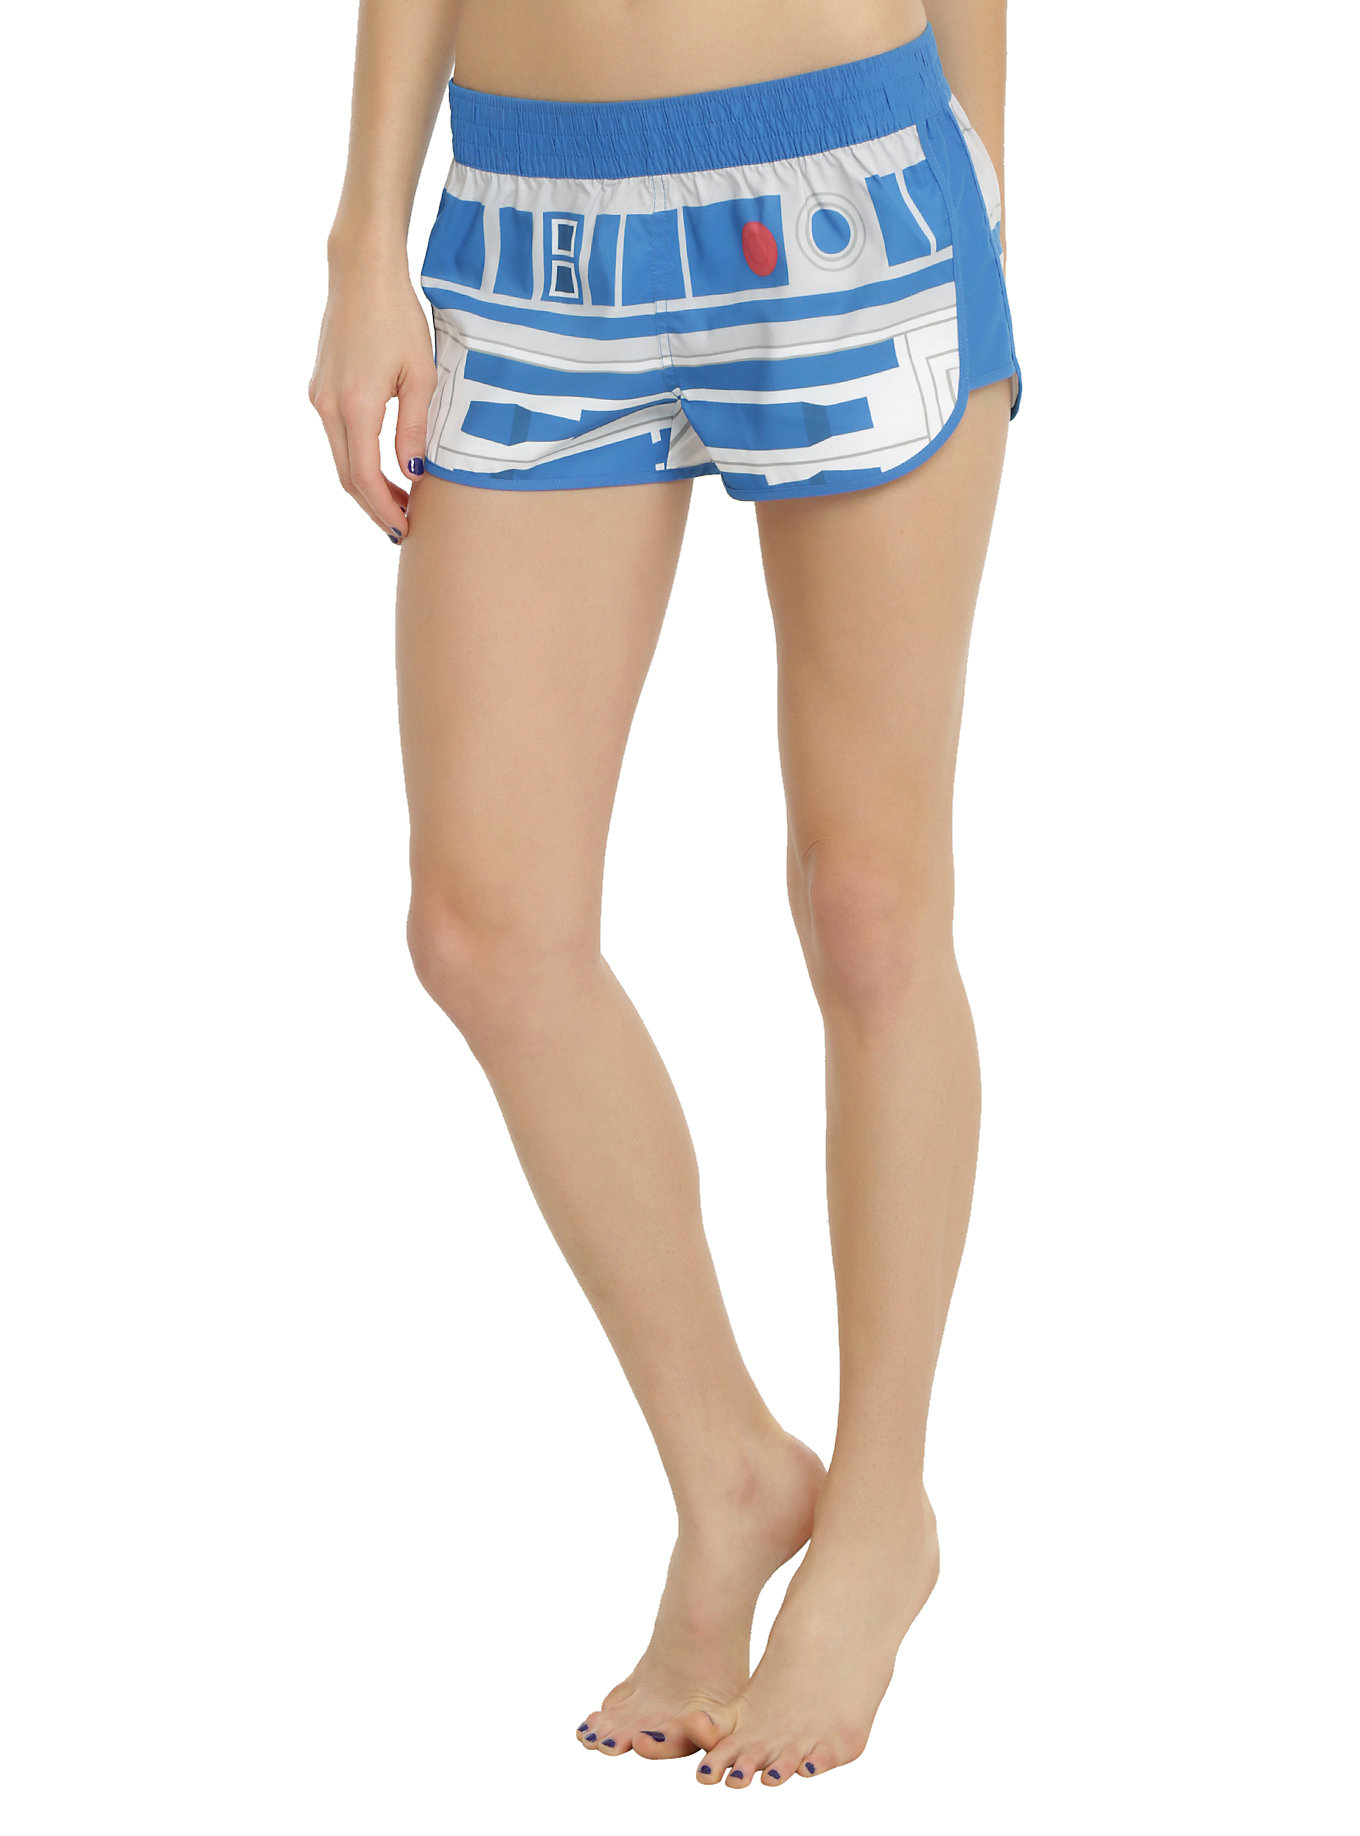 R2-D2 swim shorts at Hot Topic